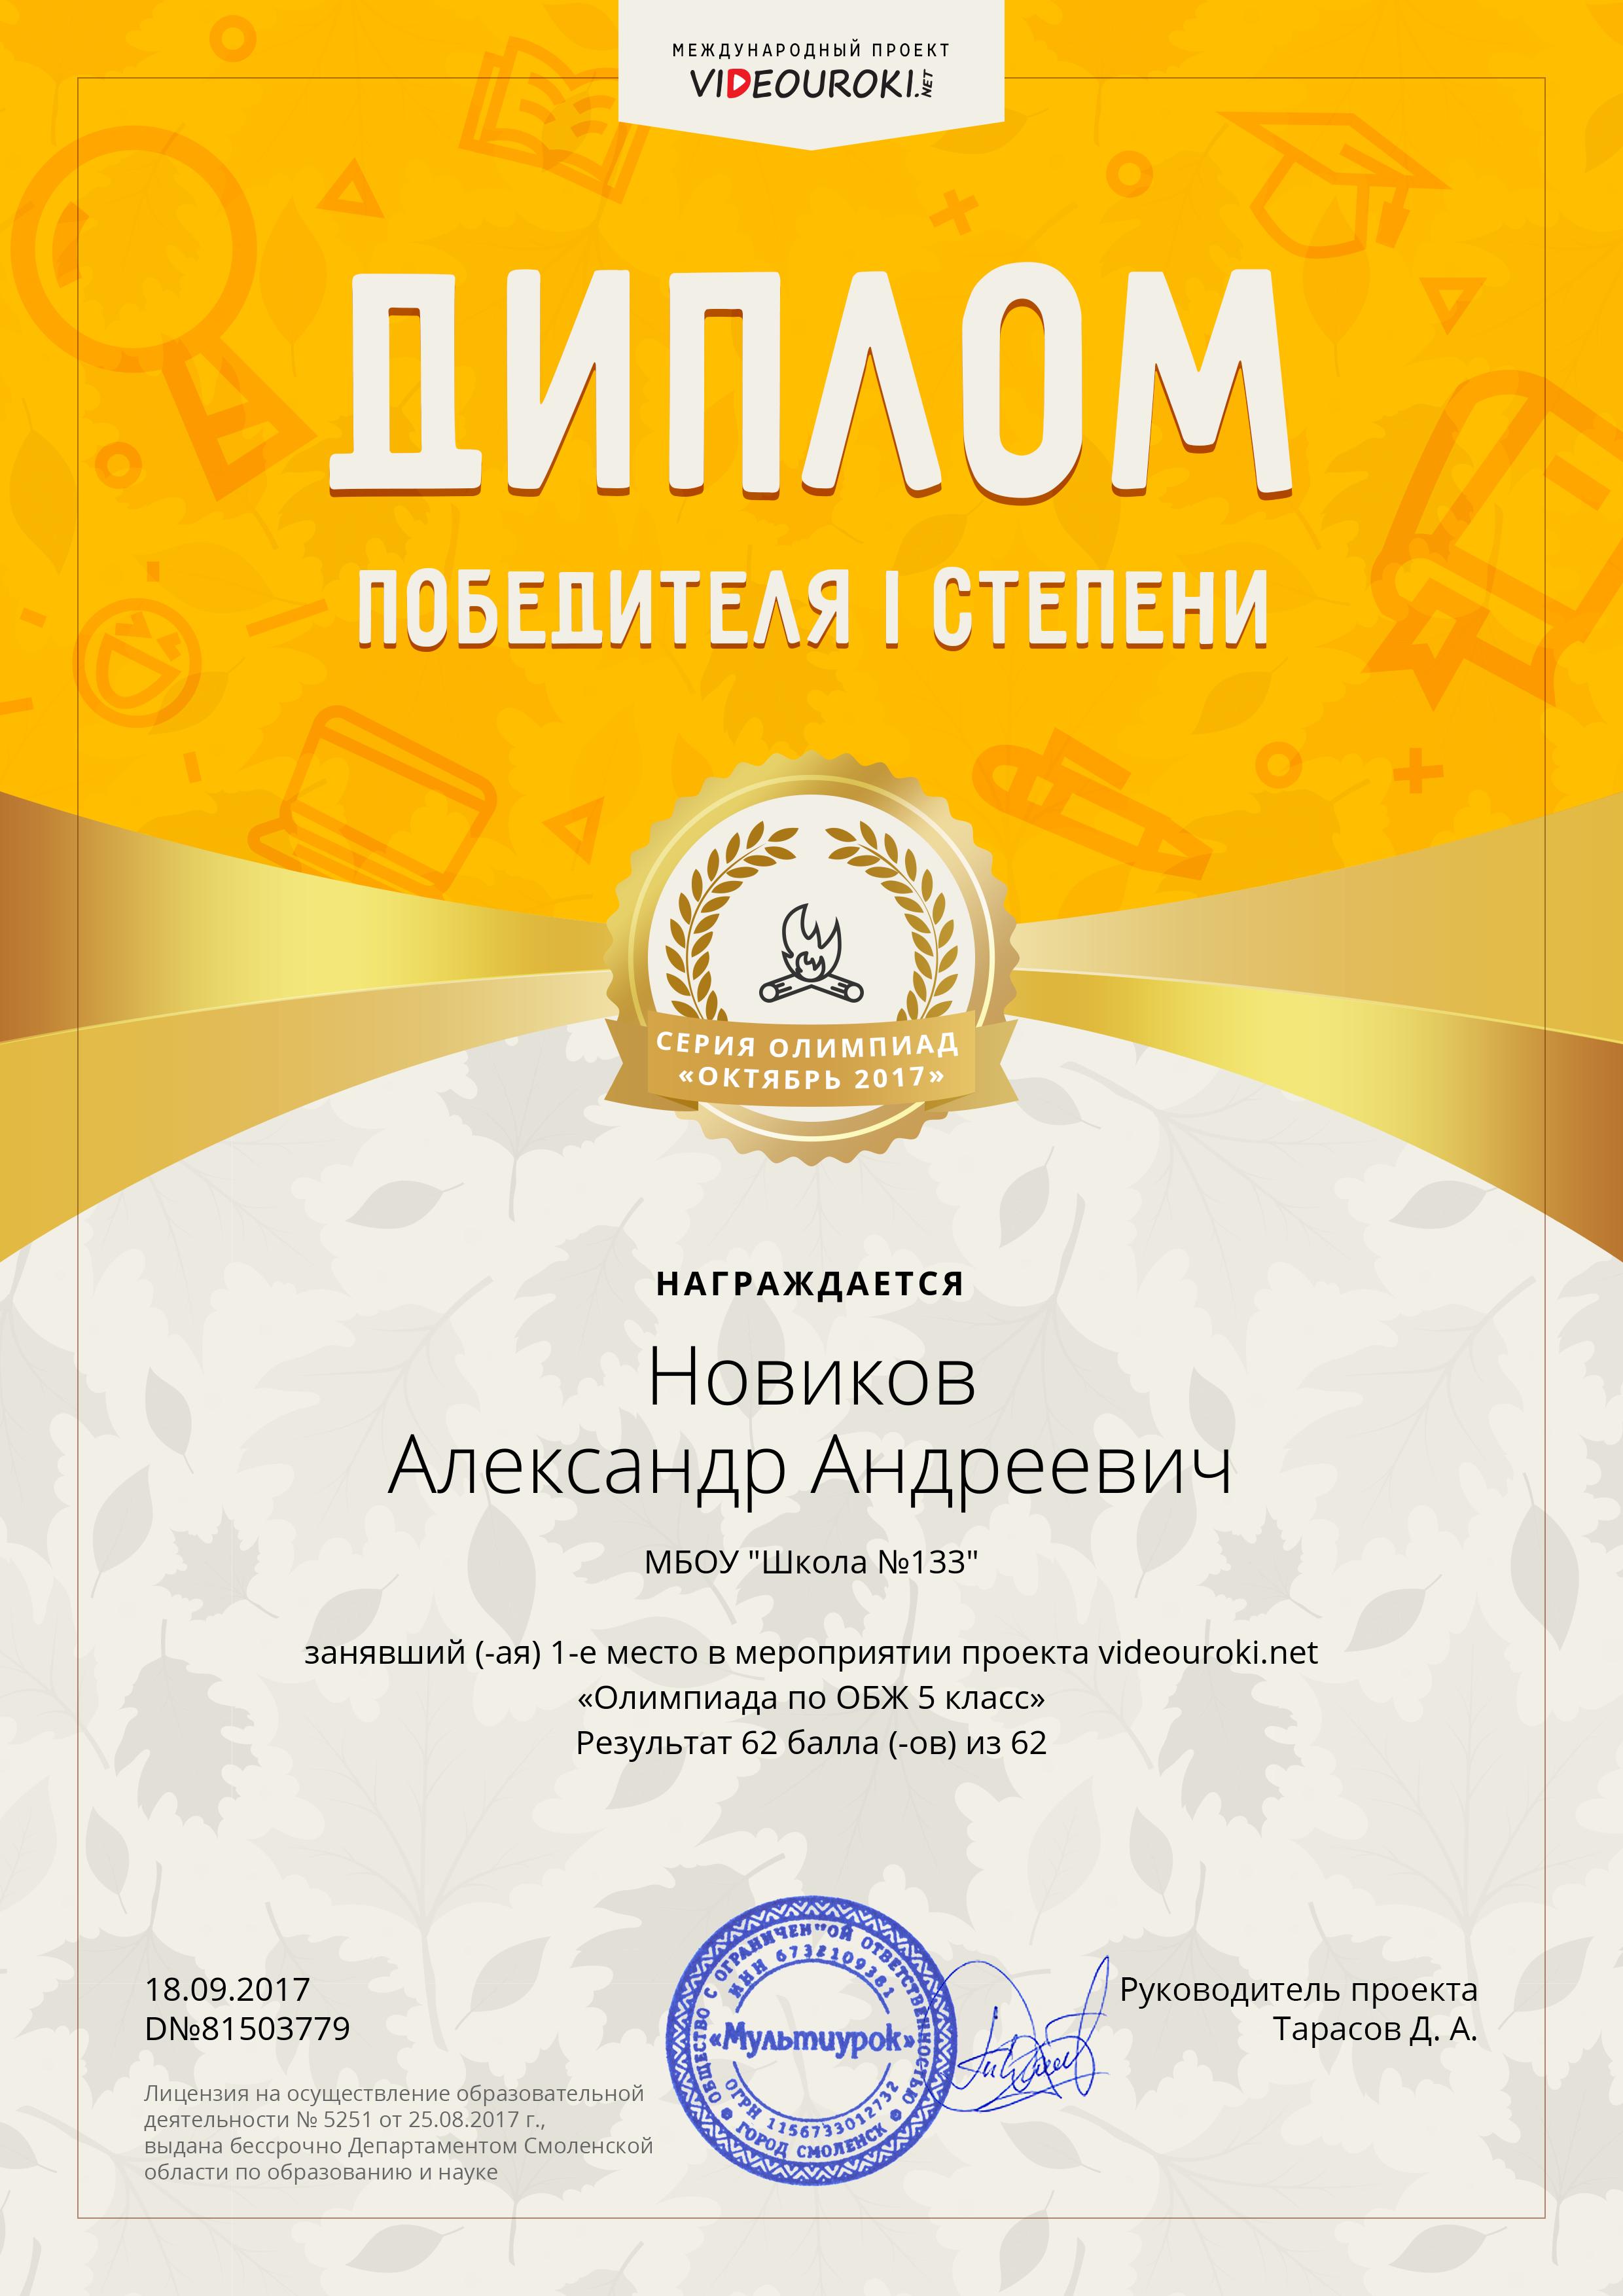 91493321. 81503779-Новиков Александр Андреевич.png